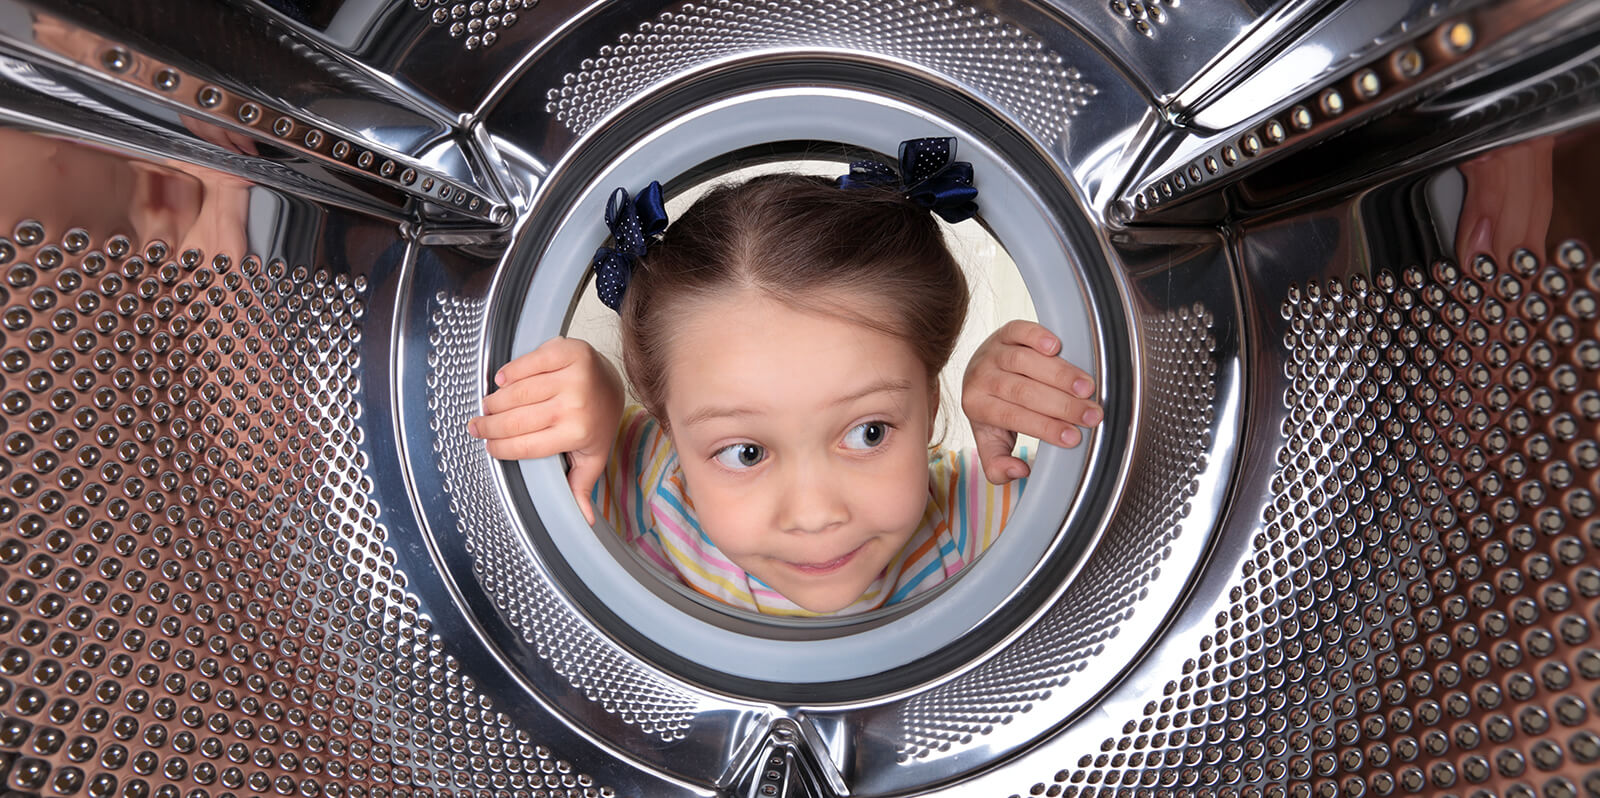 Kinderkopf in Waschmaschinentrommel